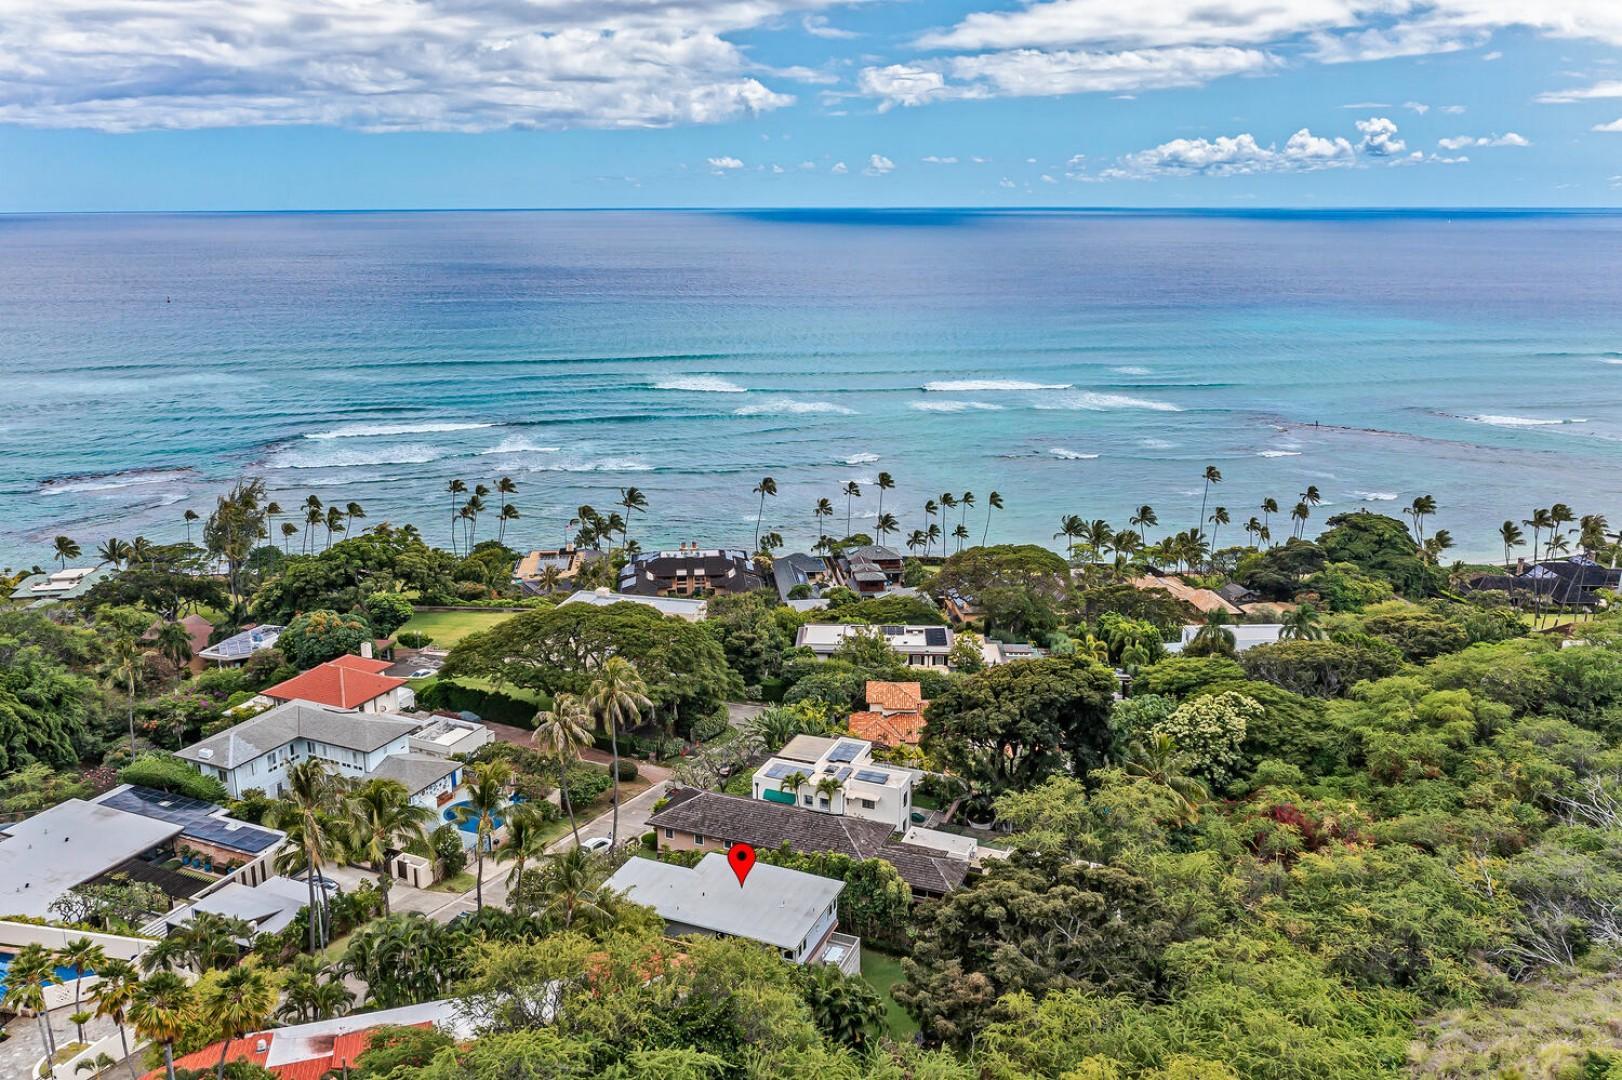 Walking distance to Waikiki and beaches